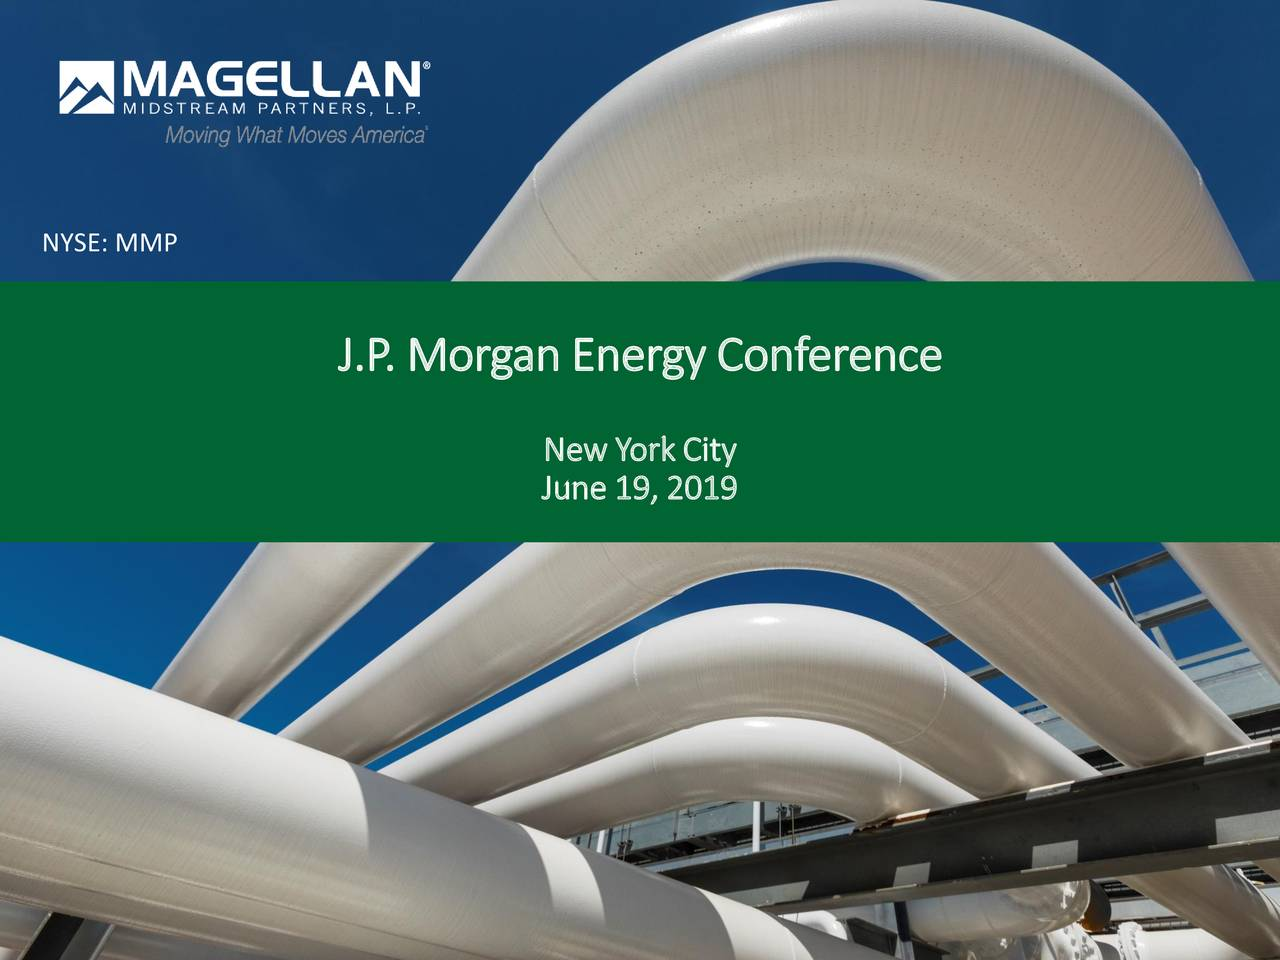 Magellan midstream partners mmp nasdaq ipo